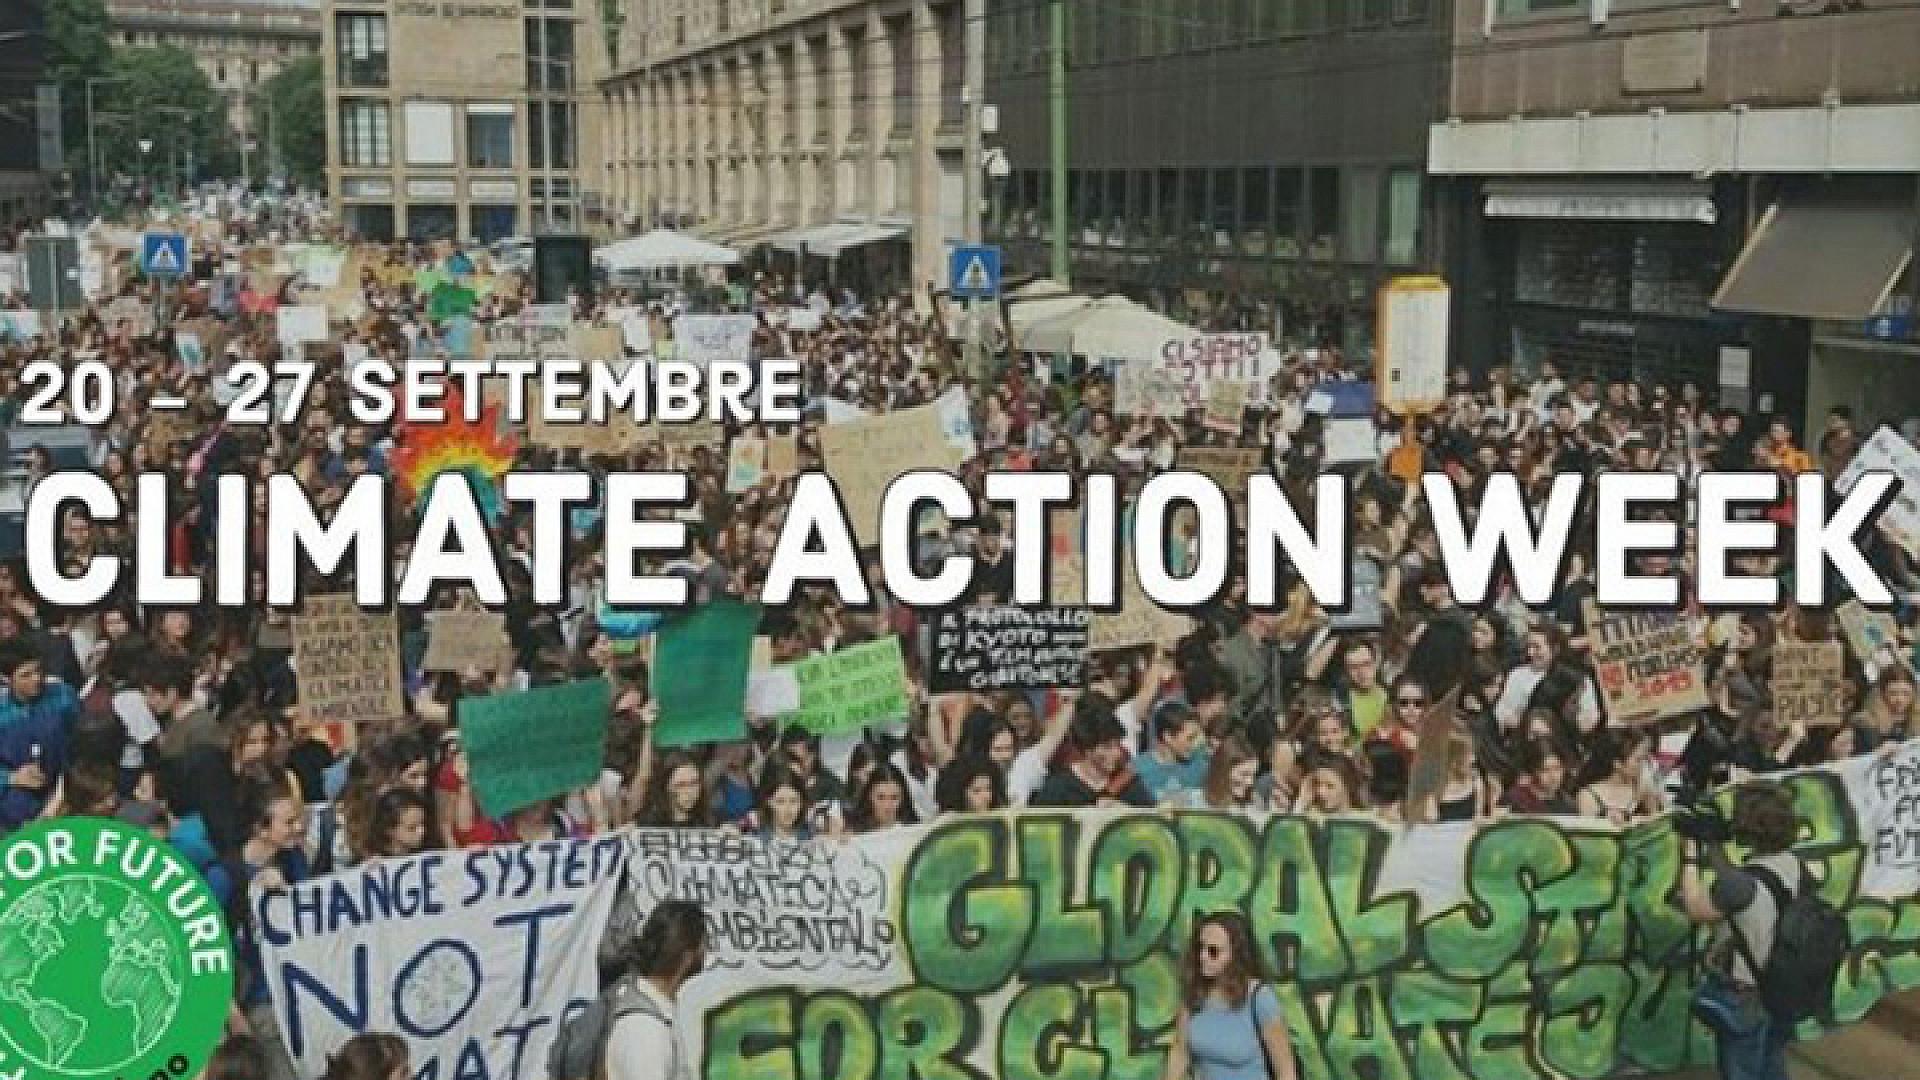 Anche la Nuova Fiera del Levante partecipa al climate action week